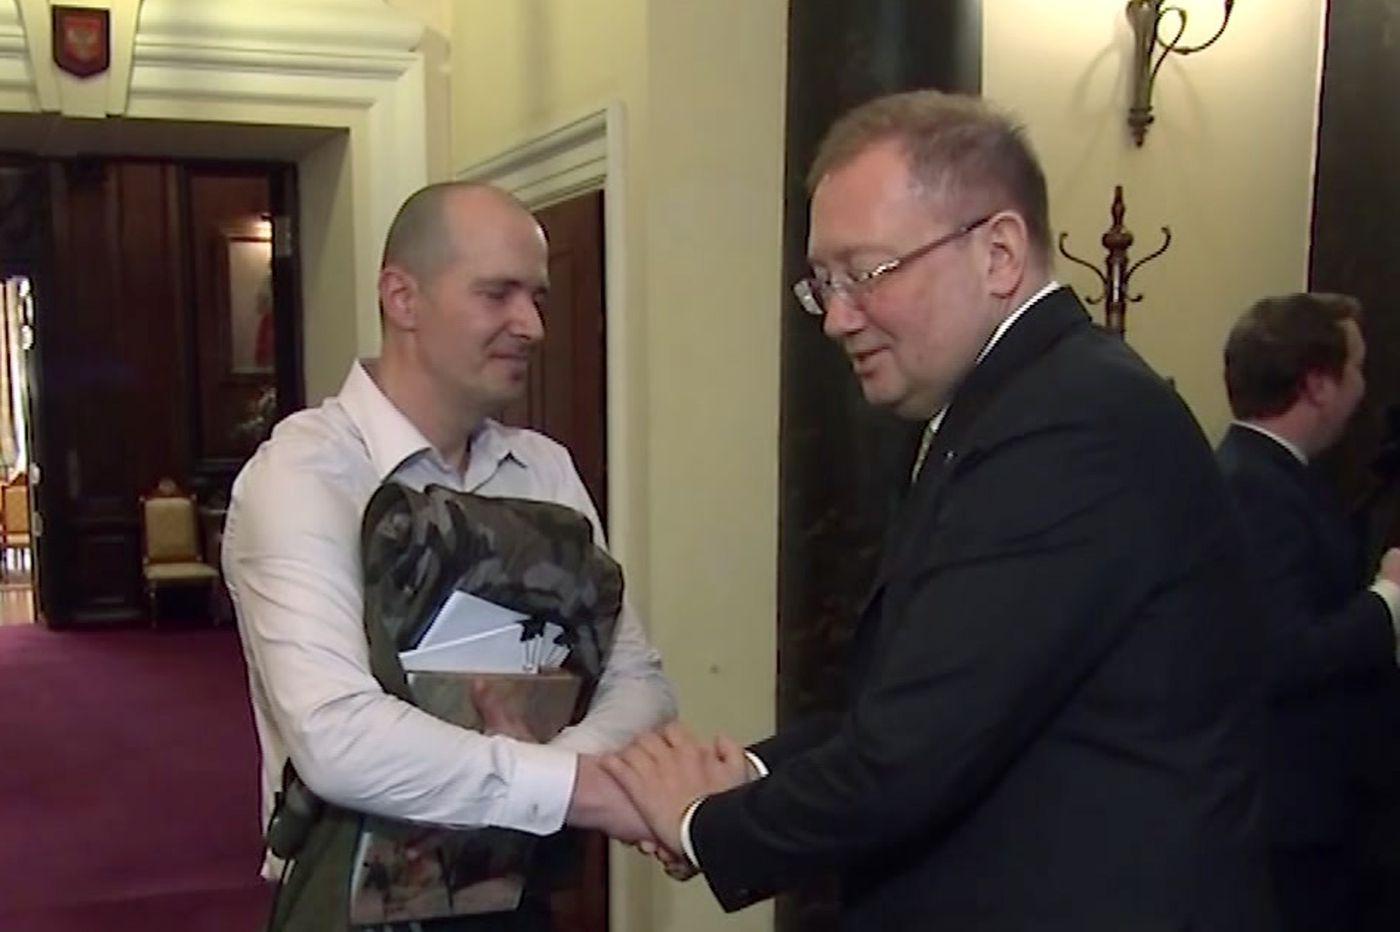 Charlie Rowley: Novichok victim meets Russian ambassador